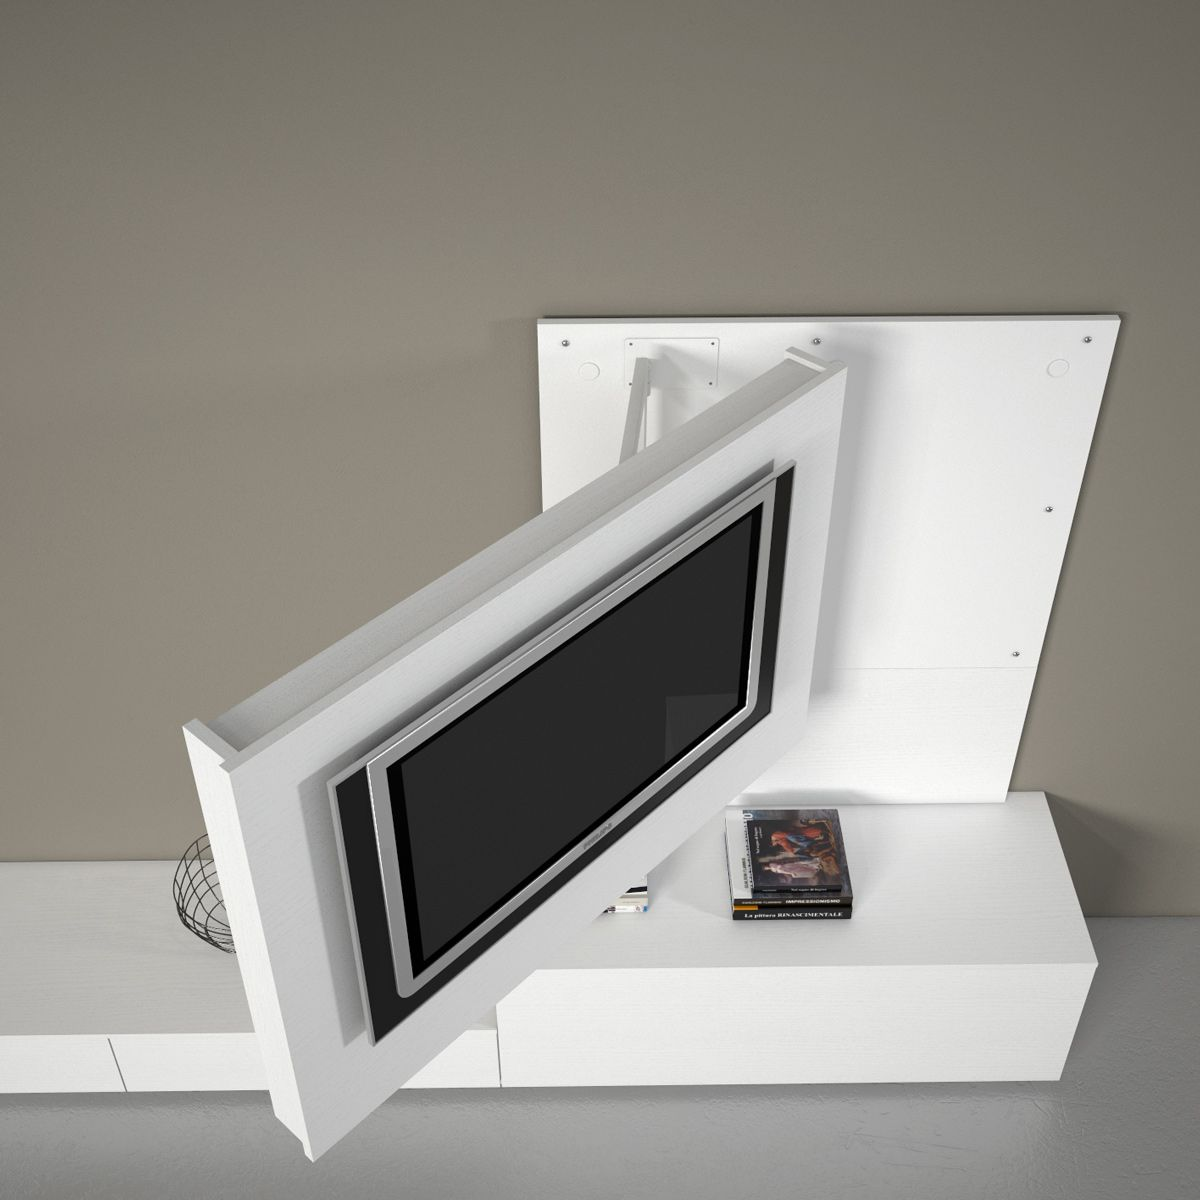 Wissmann Raumobjekte Porta Tv Girevole.Porta Tv Orientabile Girevole X2 Dettaglio Prodotto Tv Wall